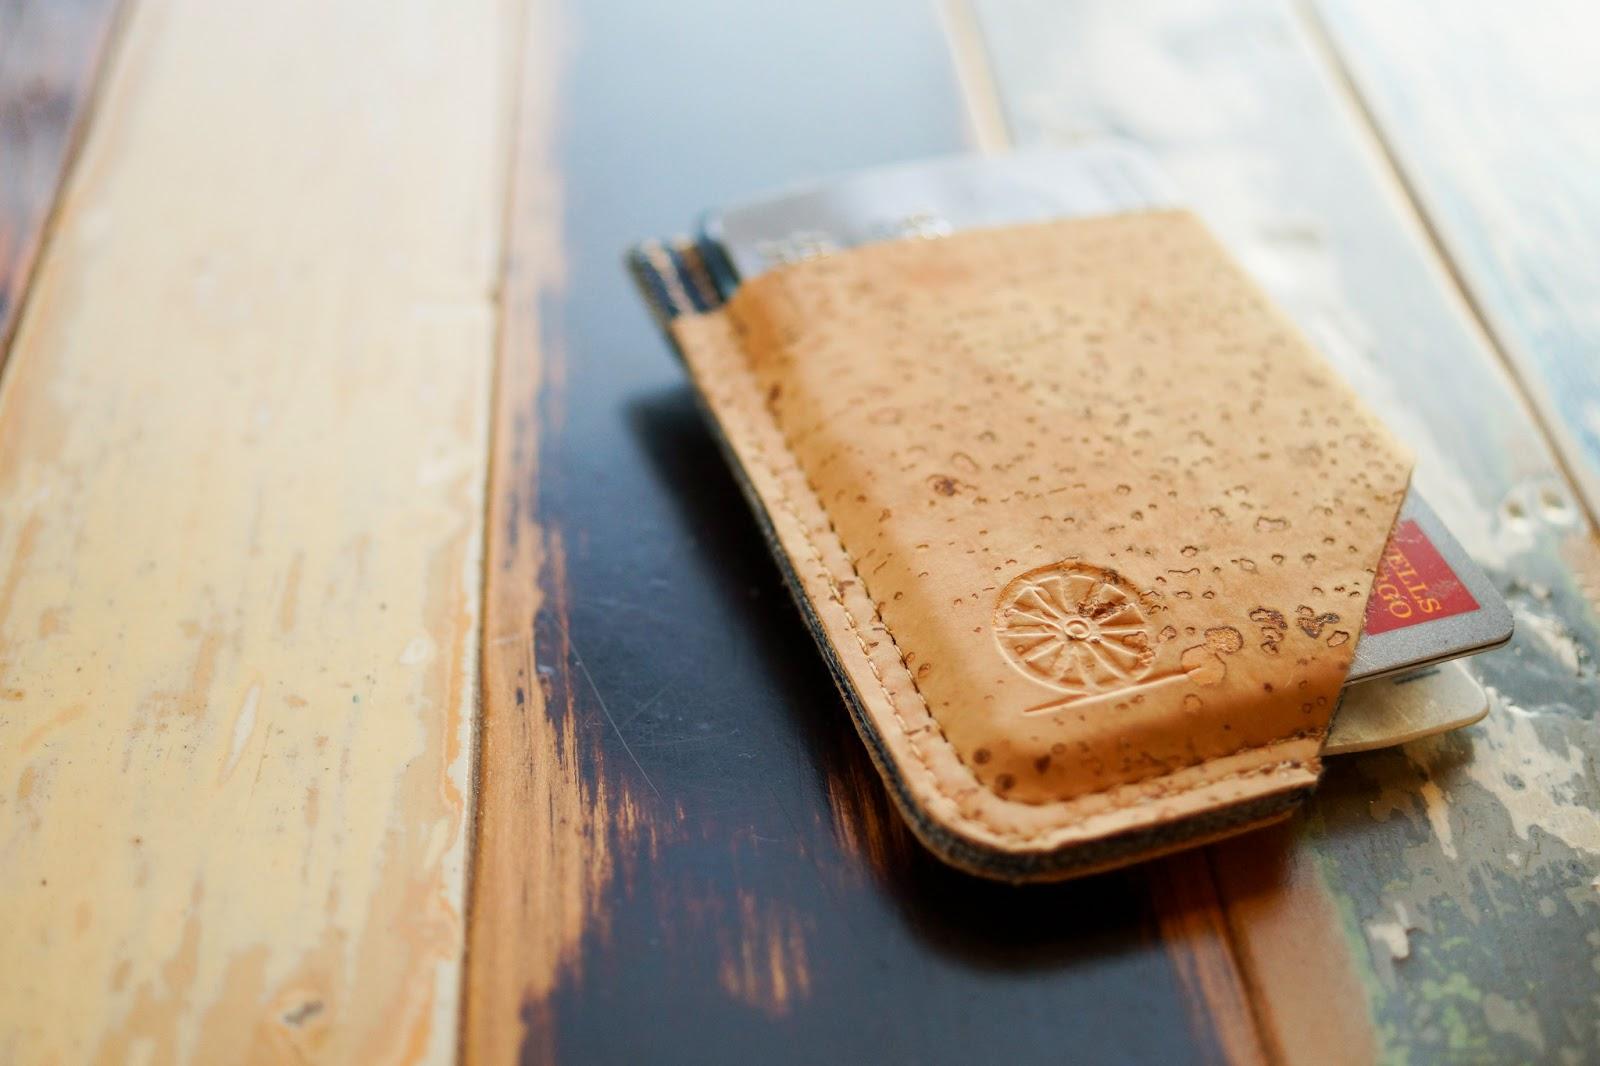 Stitch and Locke Slim Wallet